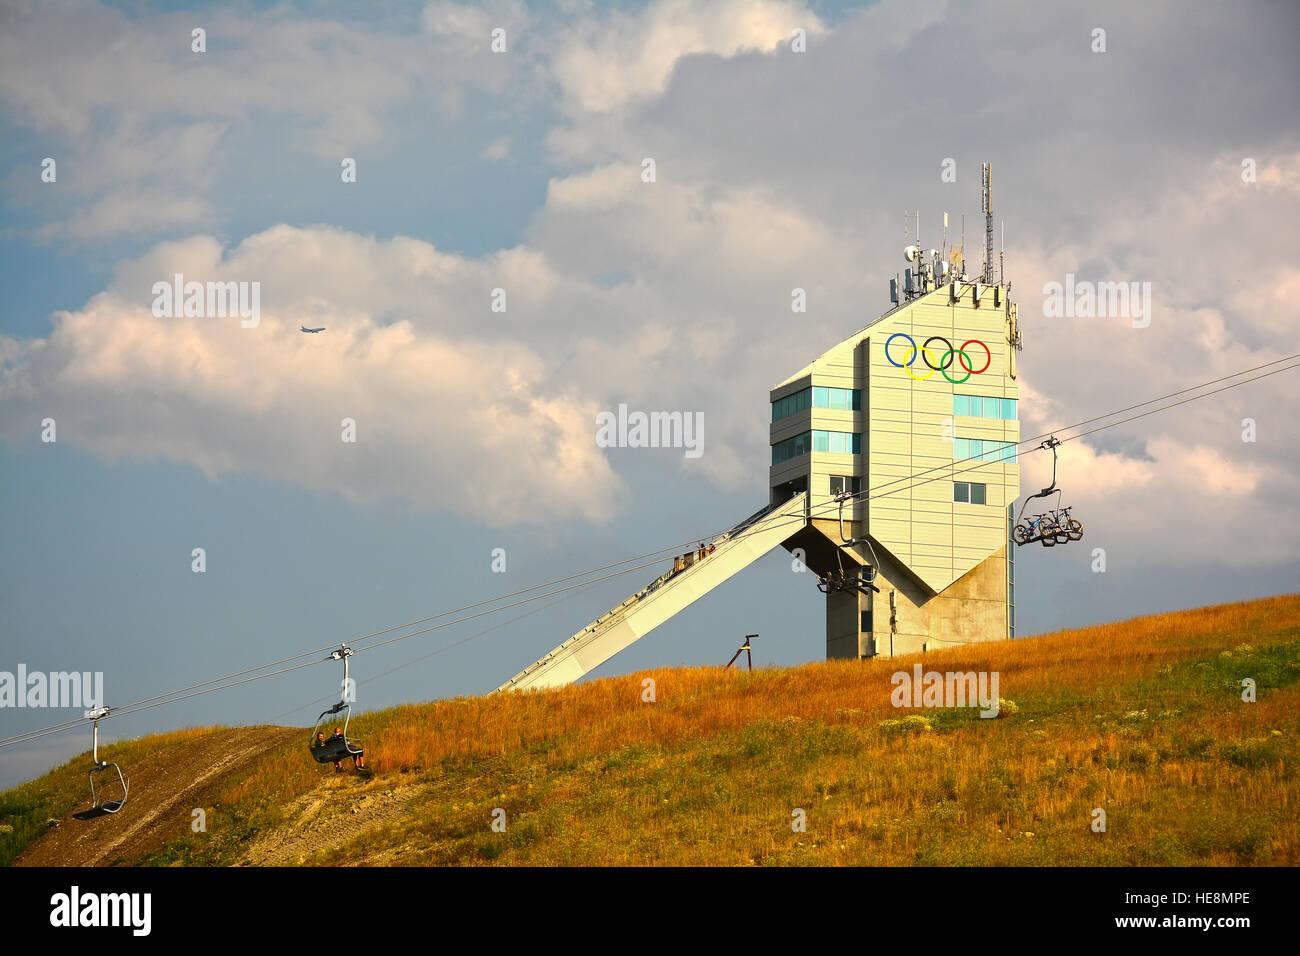 Calgary Olympic Park, Canada - Stock Image